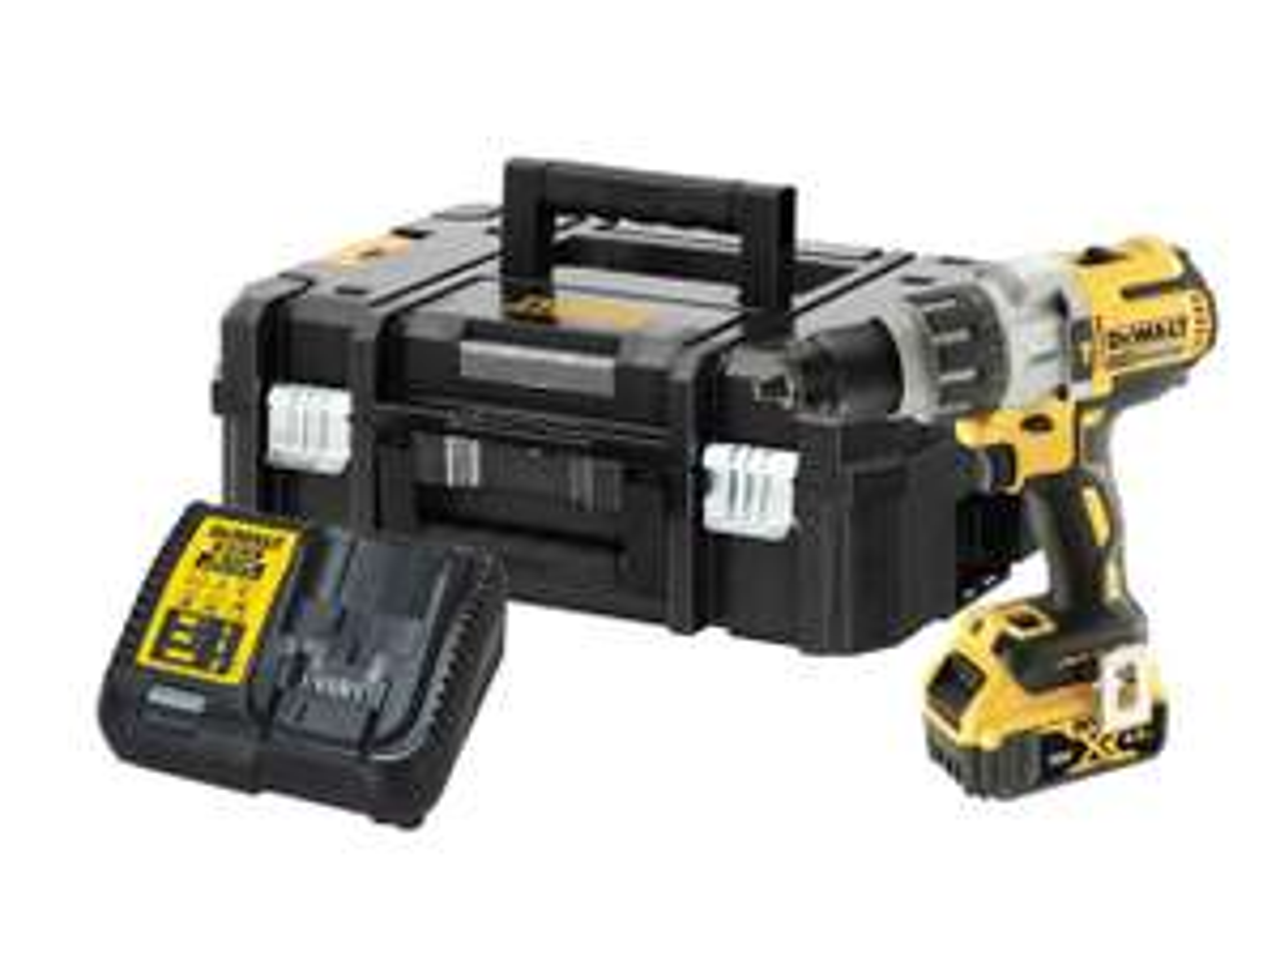 Kit Dewalt DCD996 DCD996M1 18v 1x4.0Ah XR Li-Ion Brushless Combi Drill (ffx.co.uk)